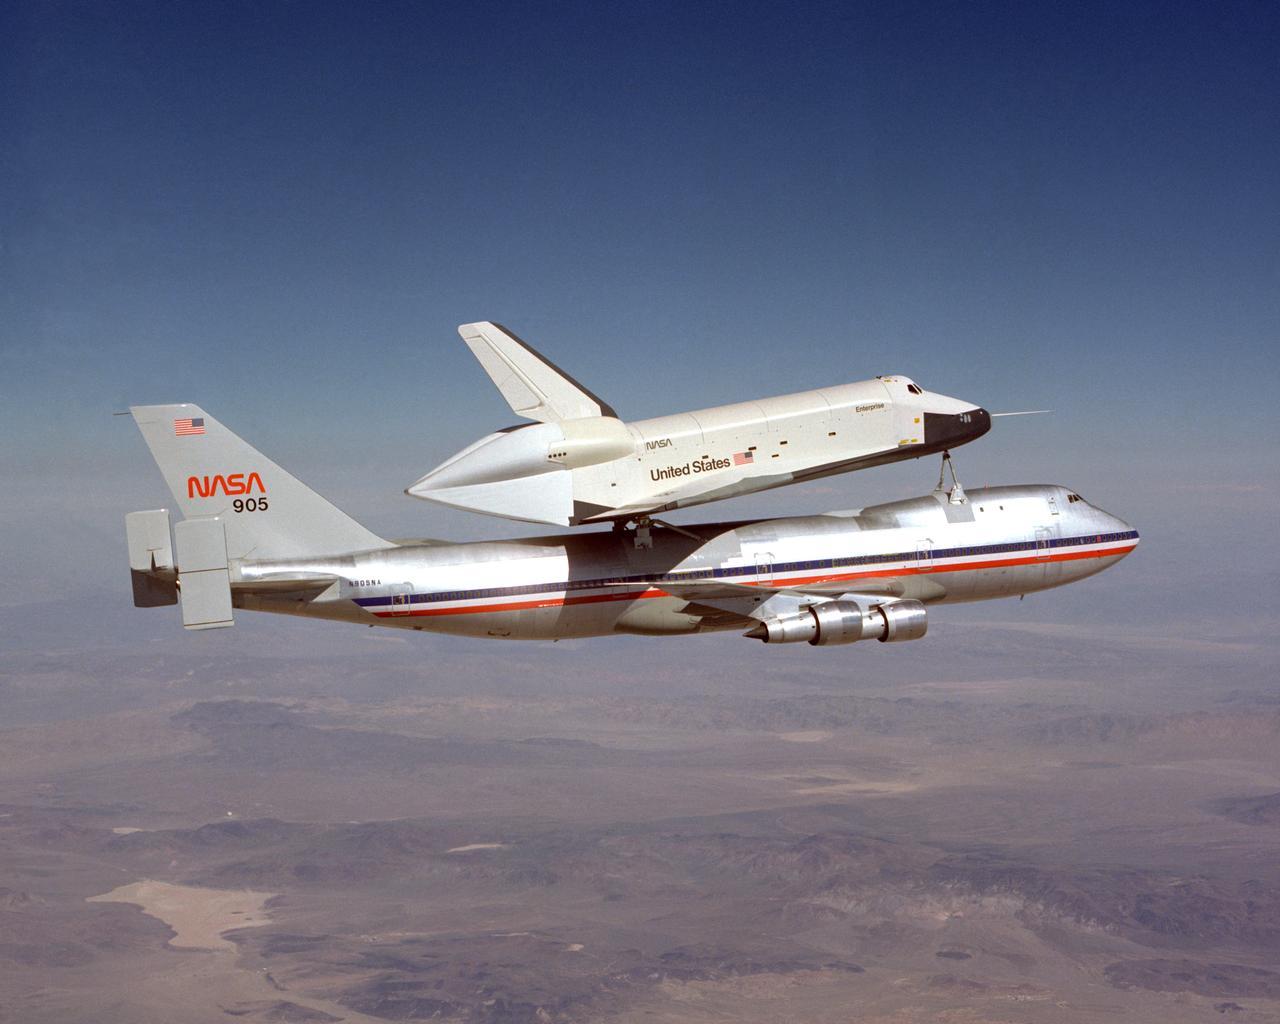 Mission Monday: Enterprise Flies Into A New Era